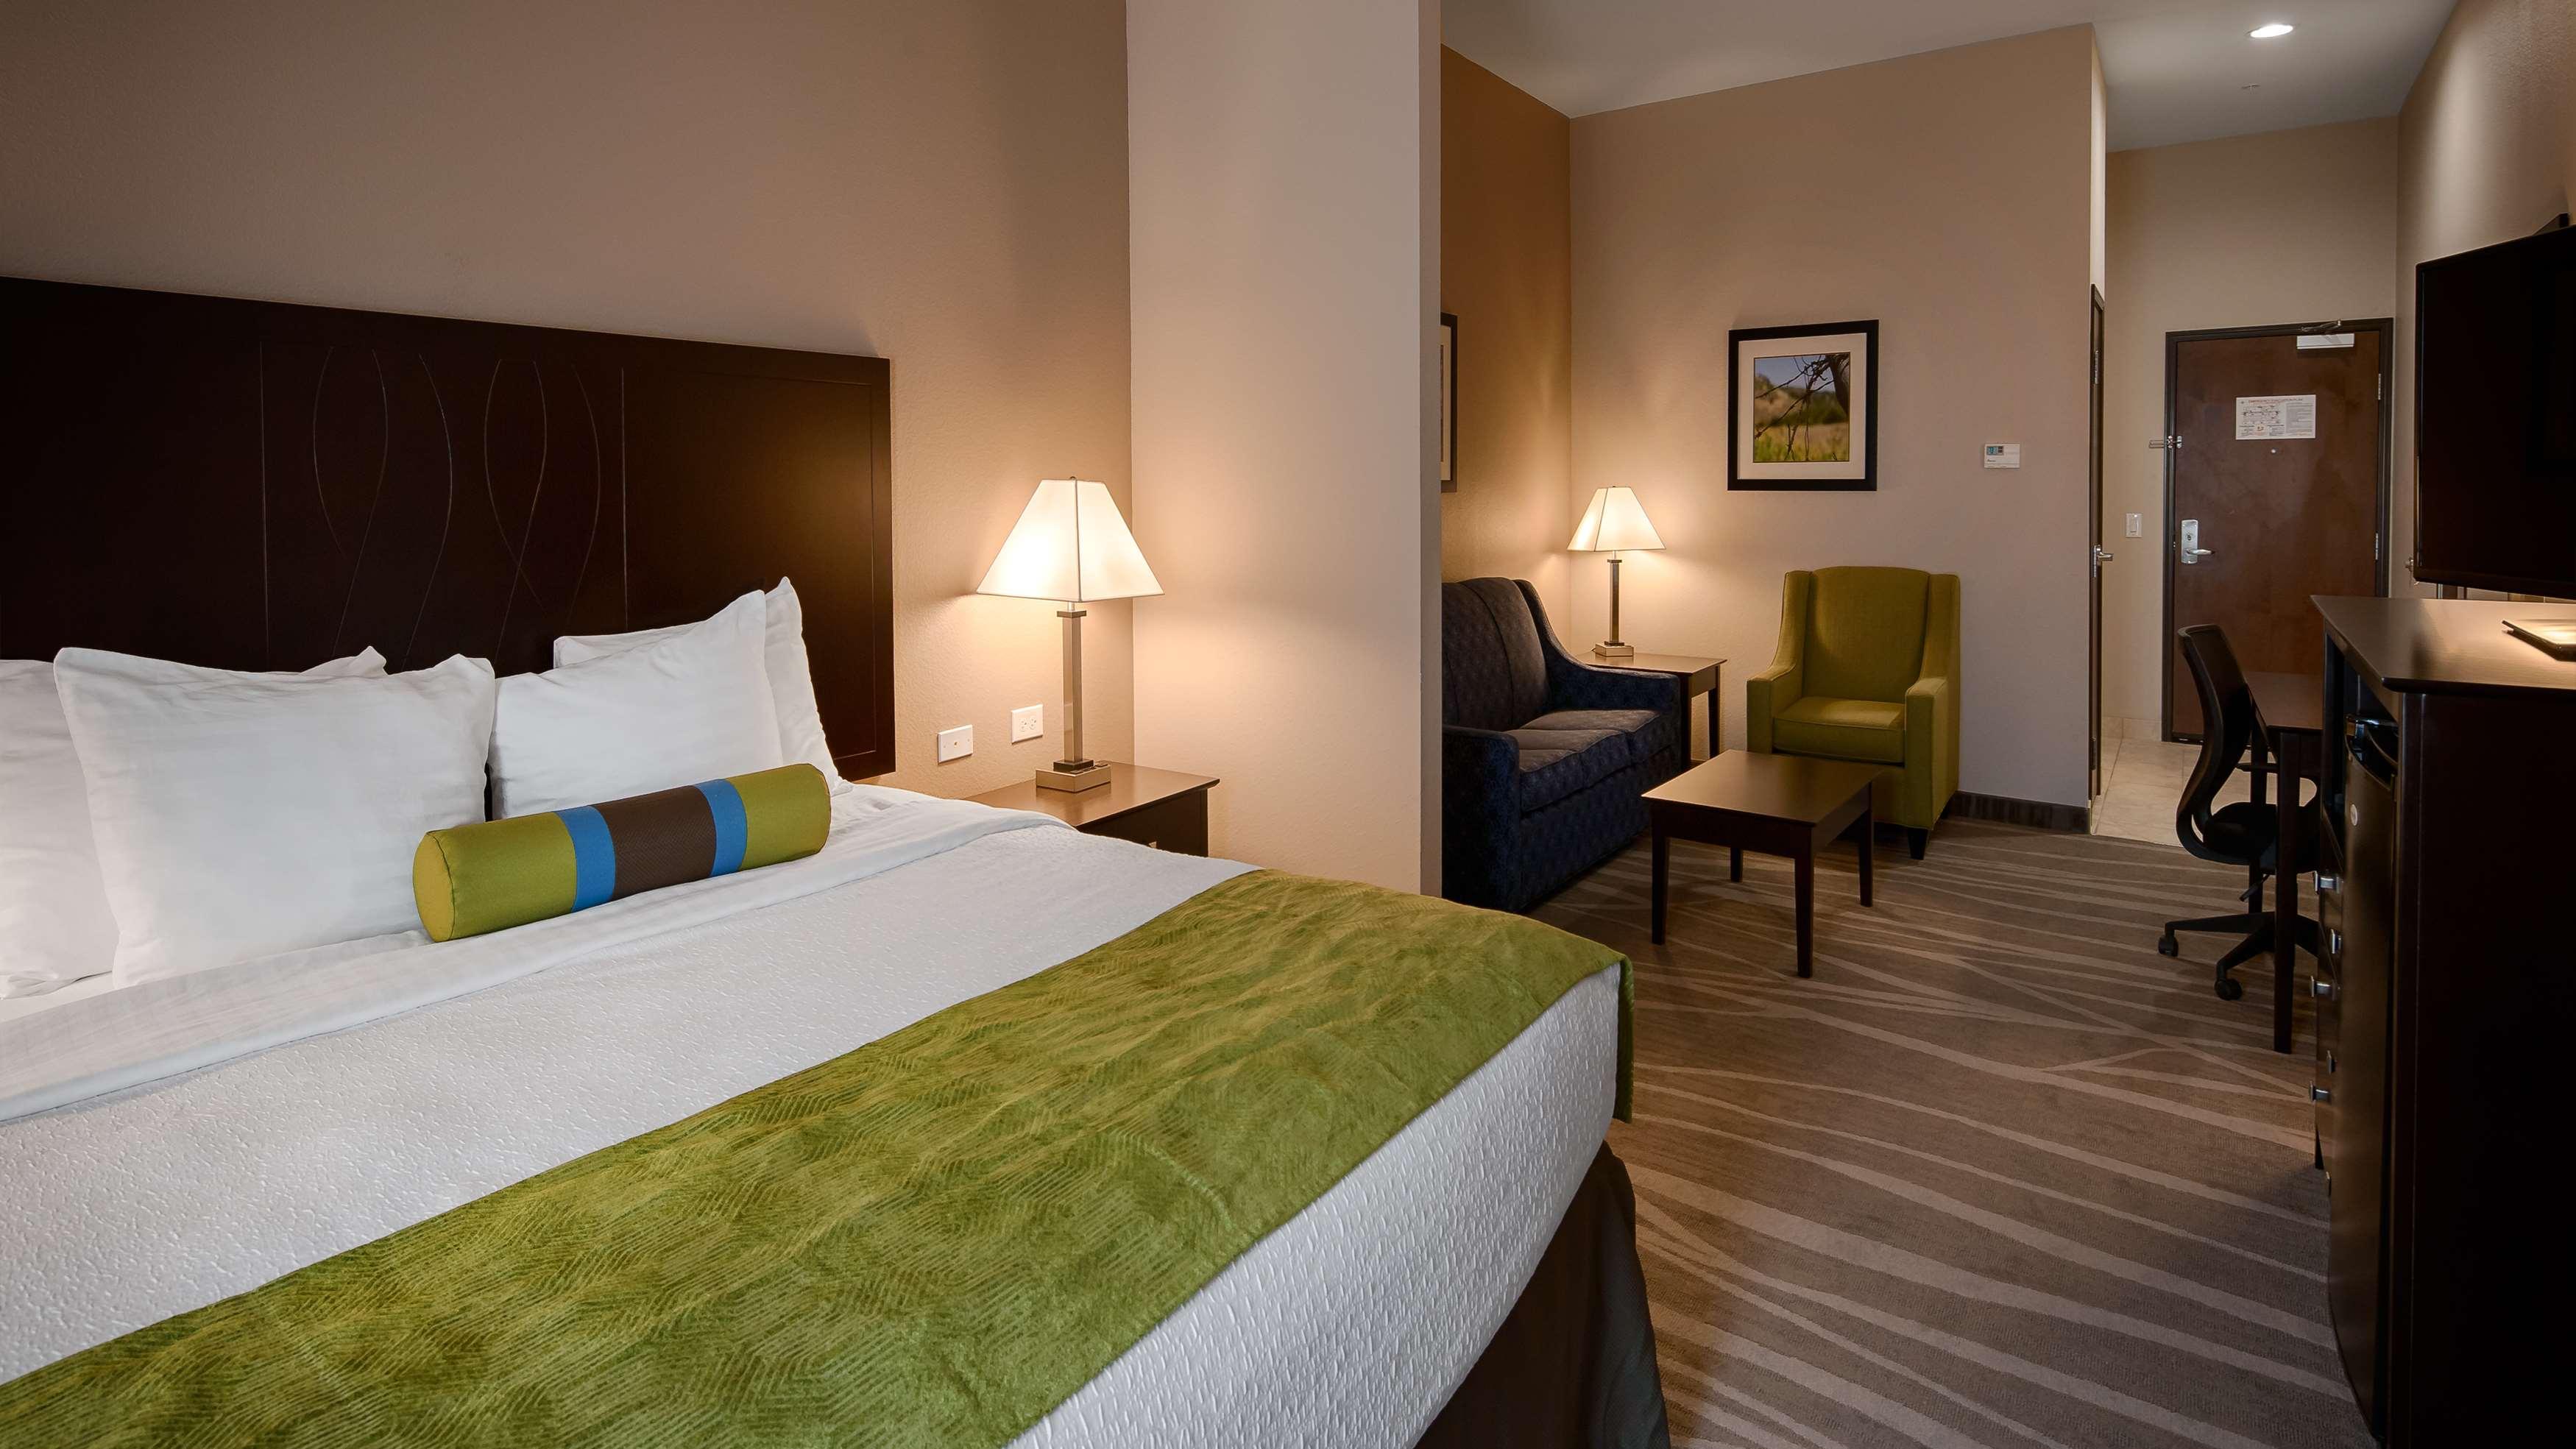 Best Western Plus Denver City Hotel & Suites image 9